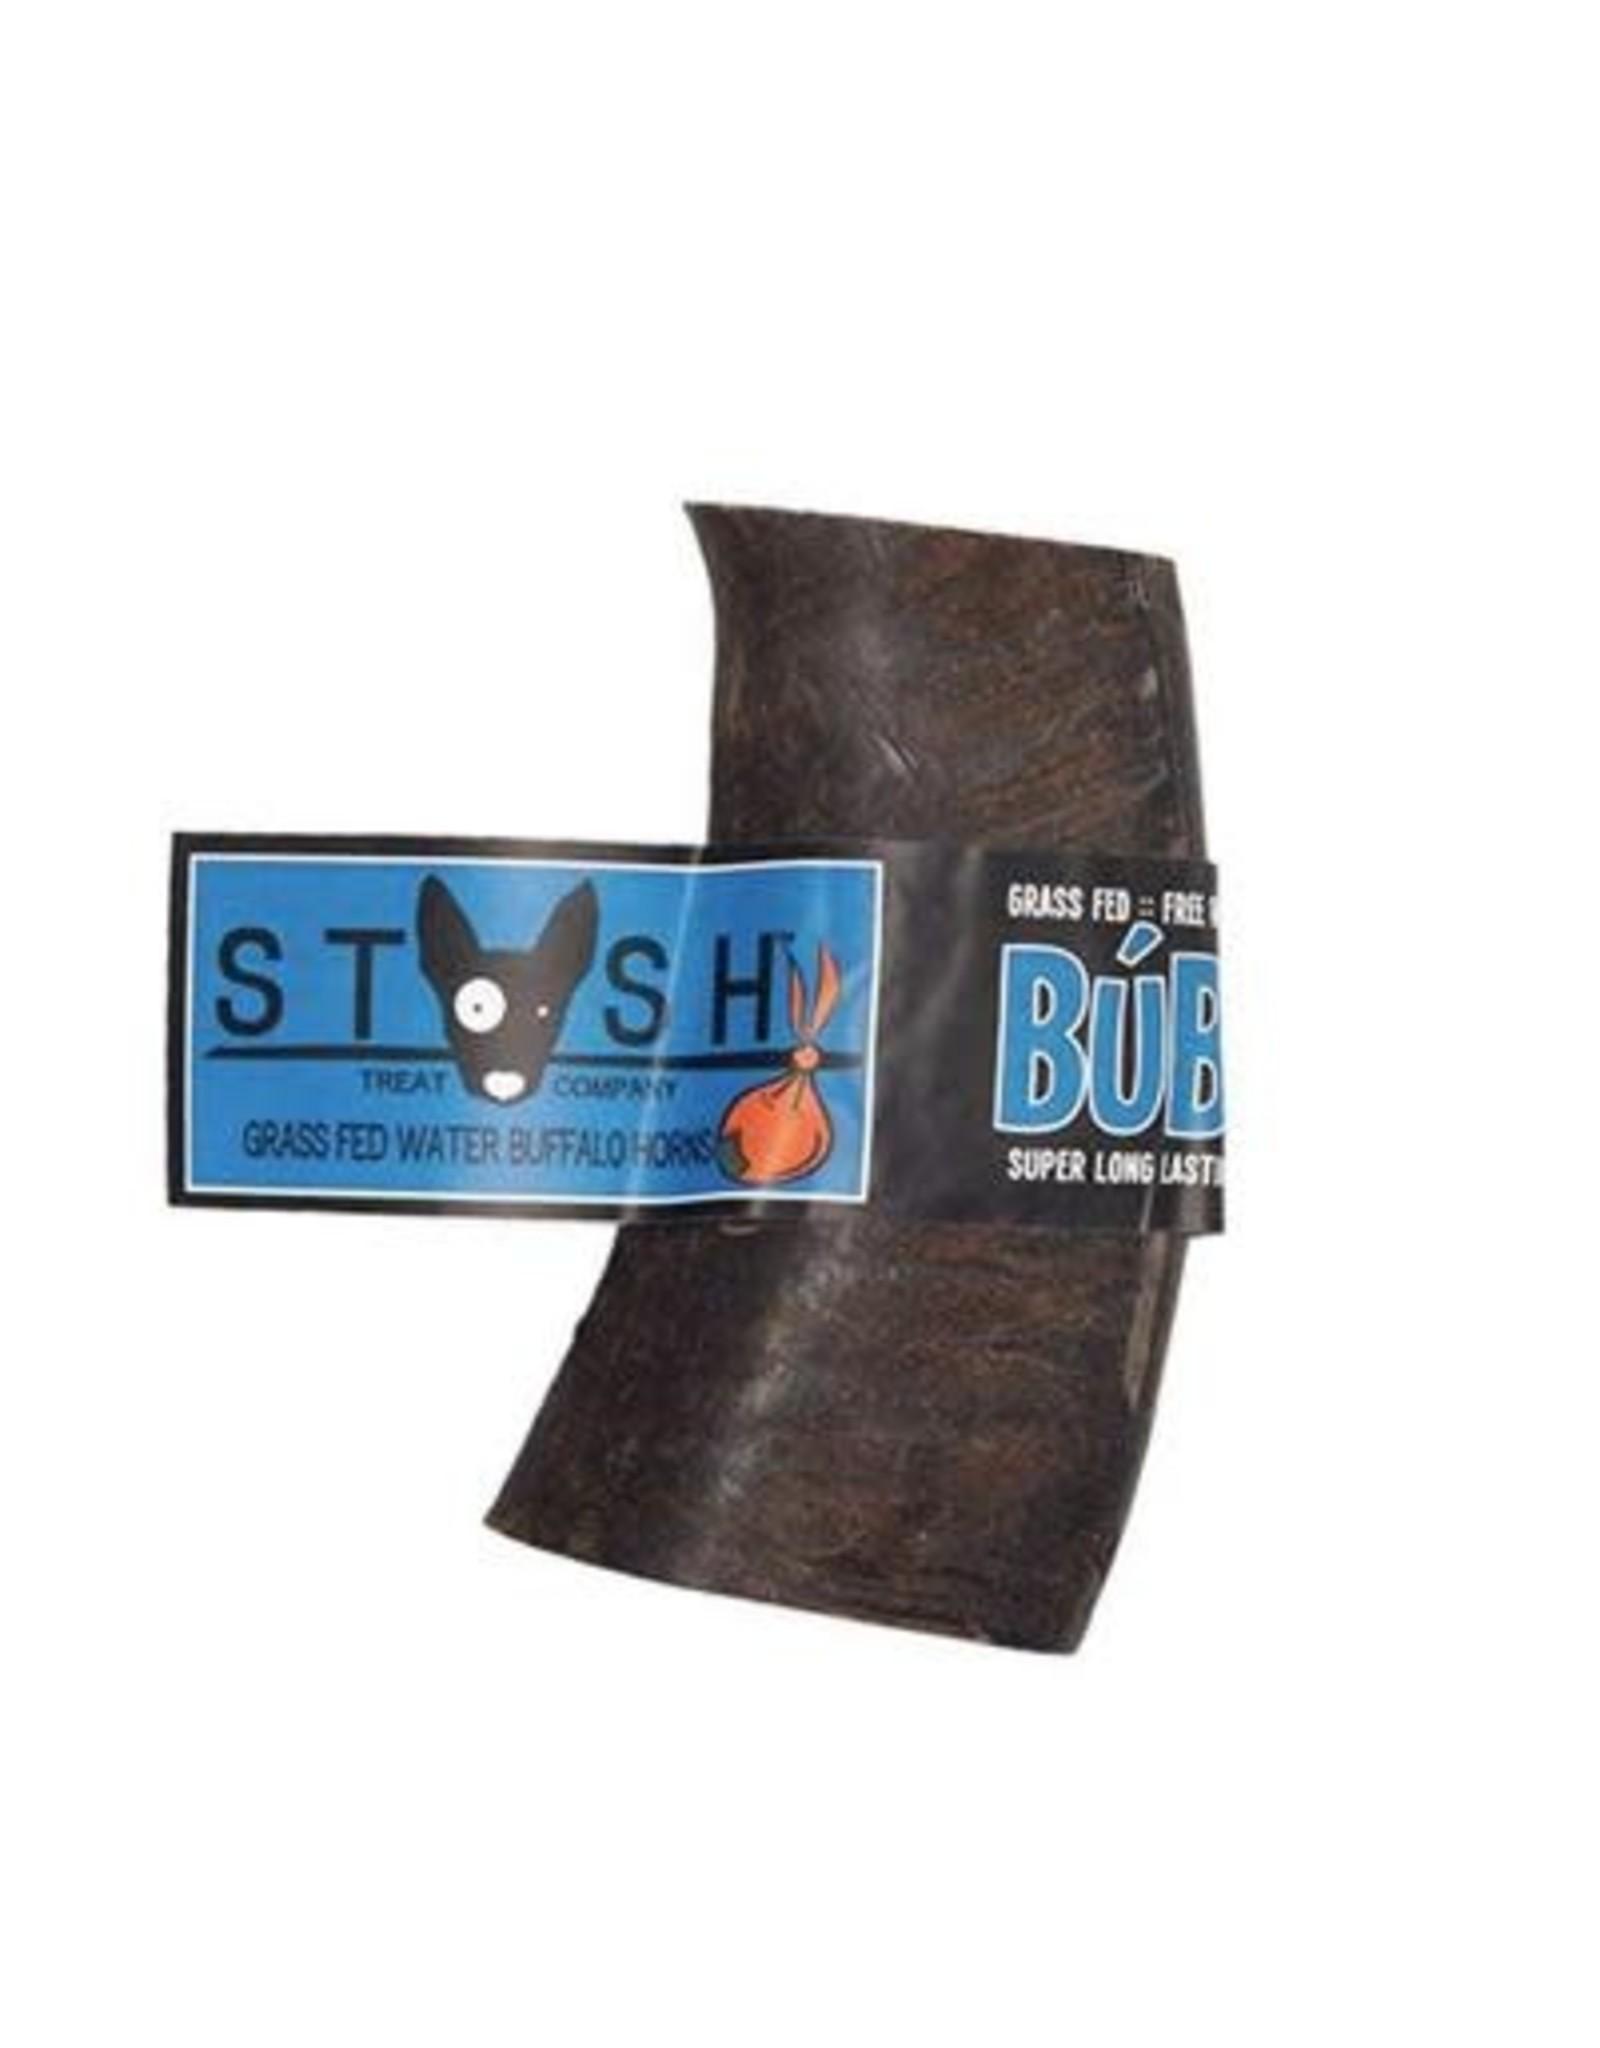 Stash Treat Company STASH BUBA CHEW WATER BUFFALO HORN